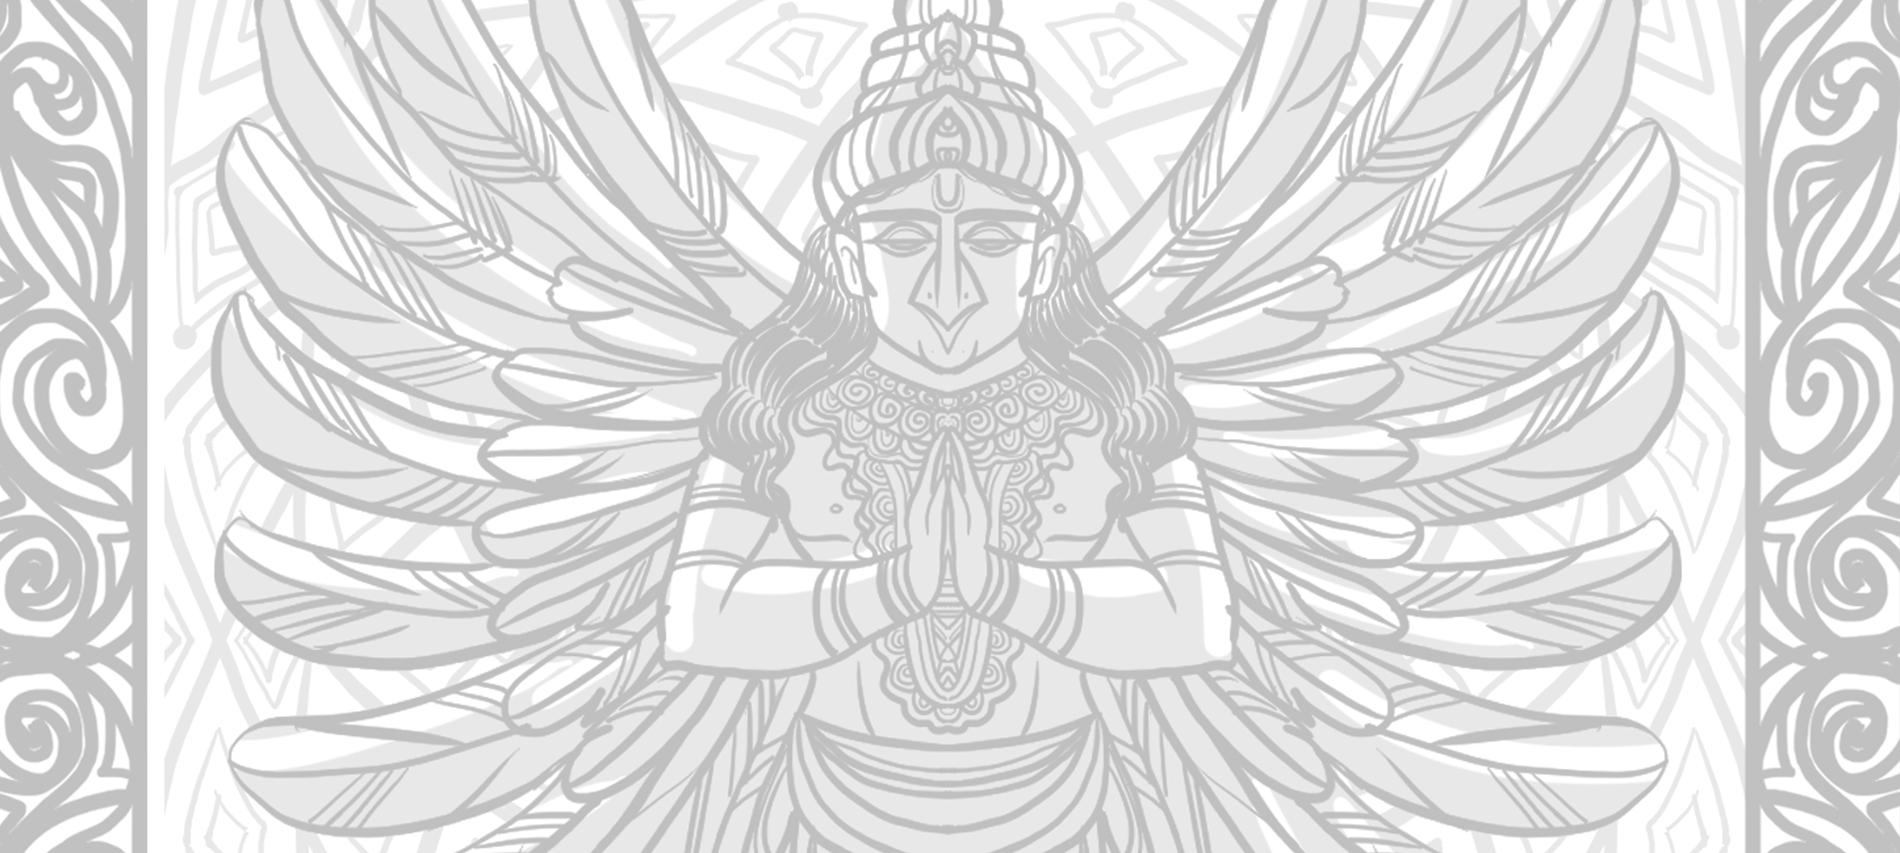 Meet the Deities from Hindu Mythology